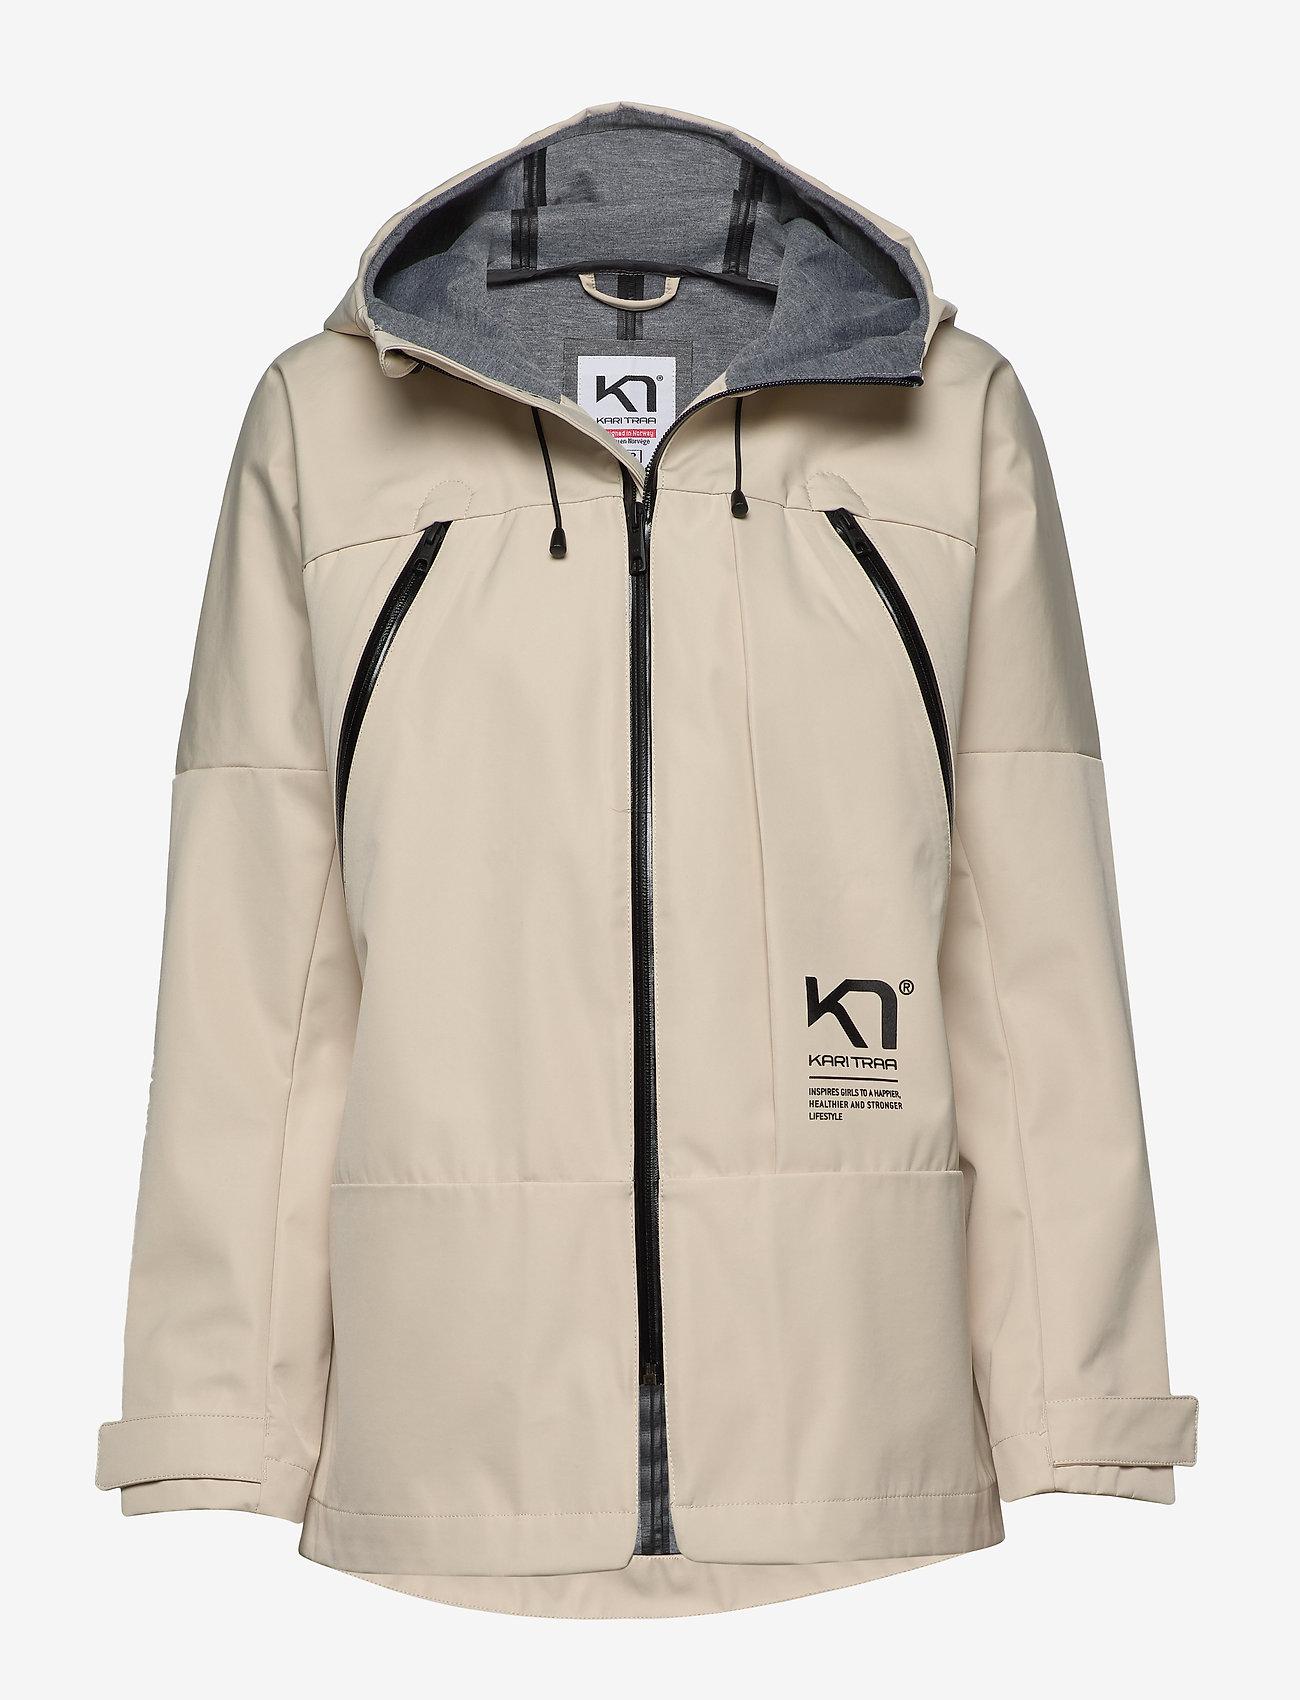 Bavallen Jacket (White) - Kari Traa DGW9W1